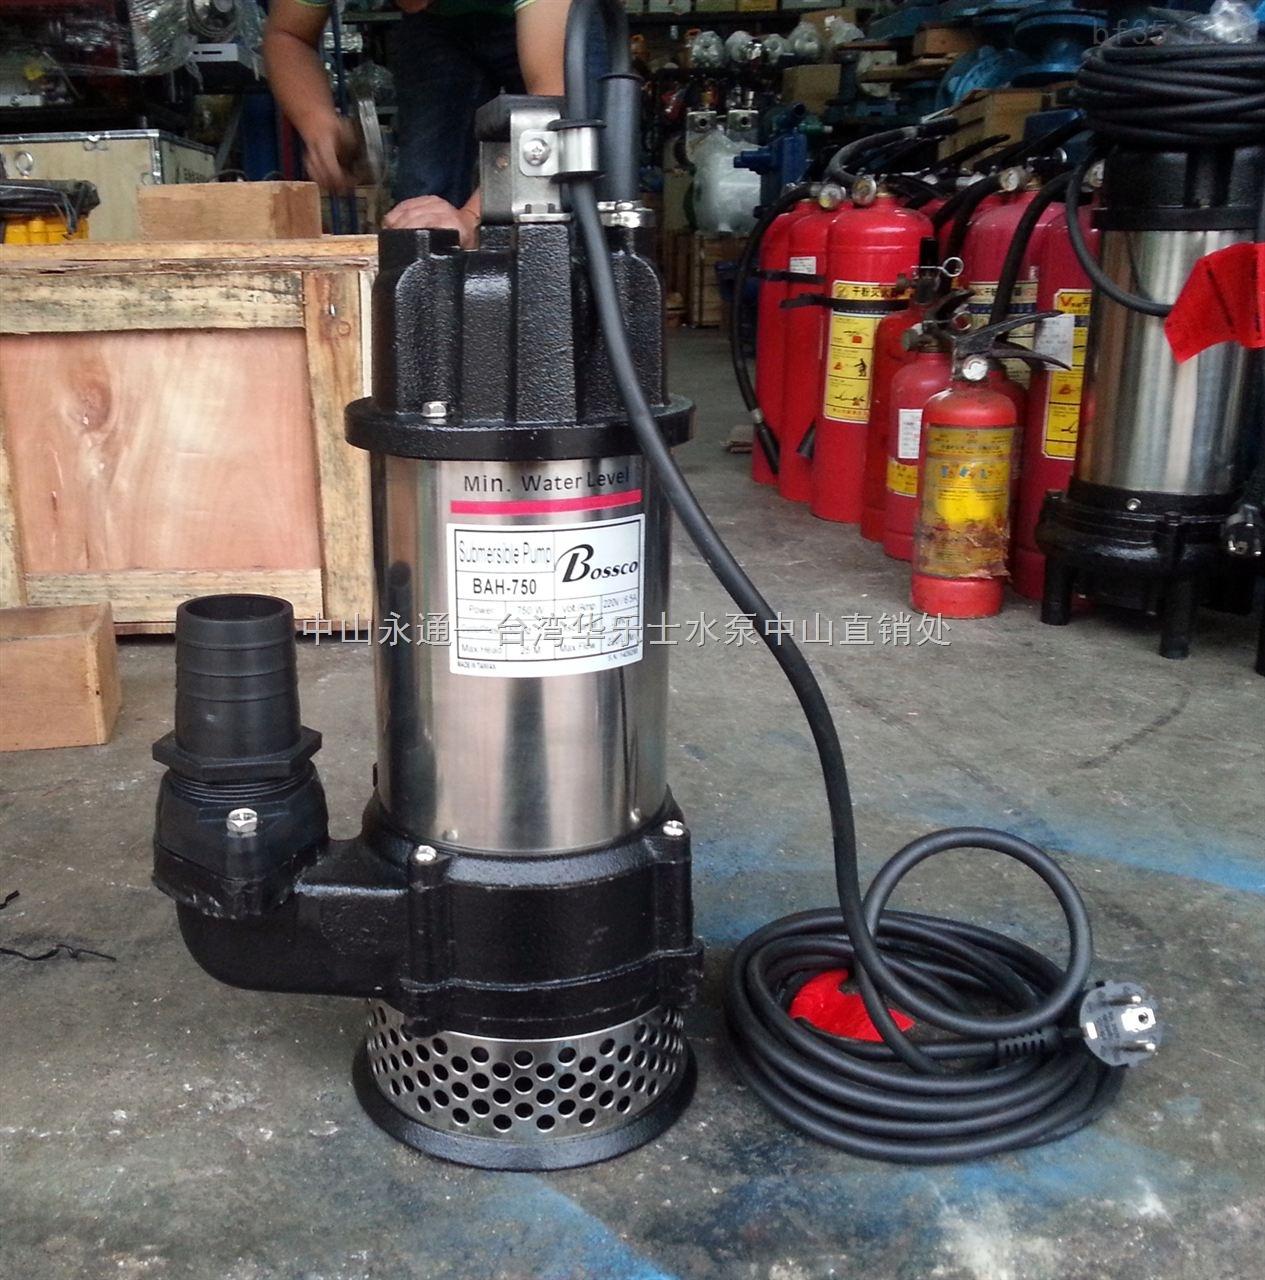 bossco 单相gd-20纺织厂潜水排污泵